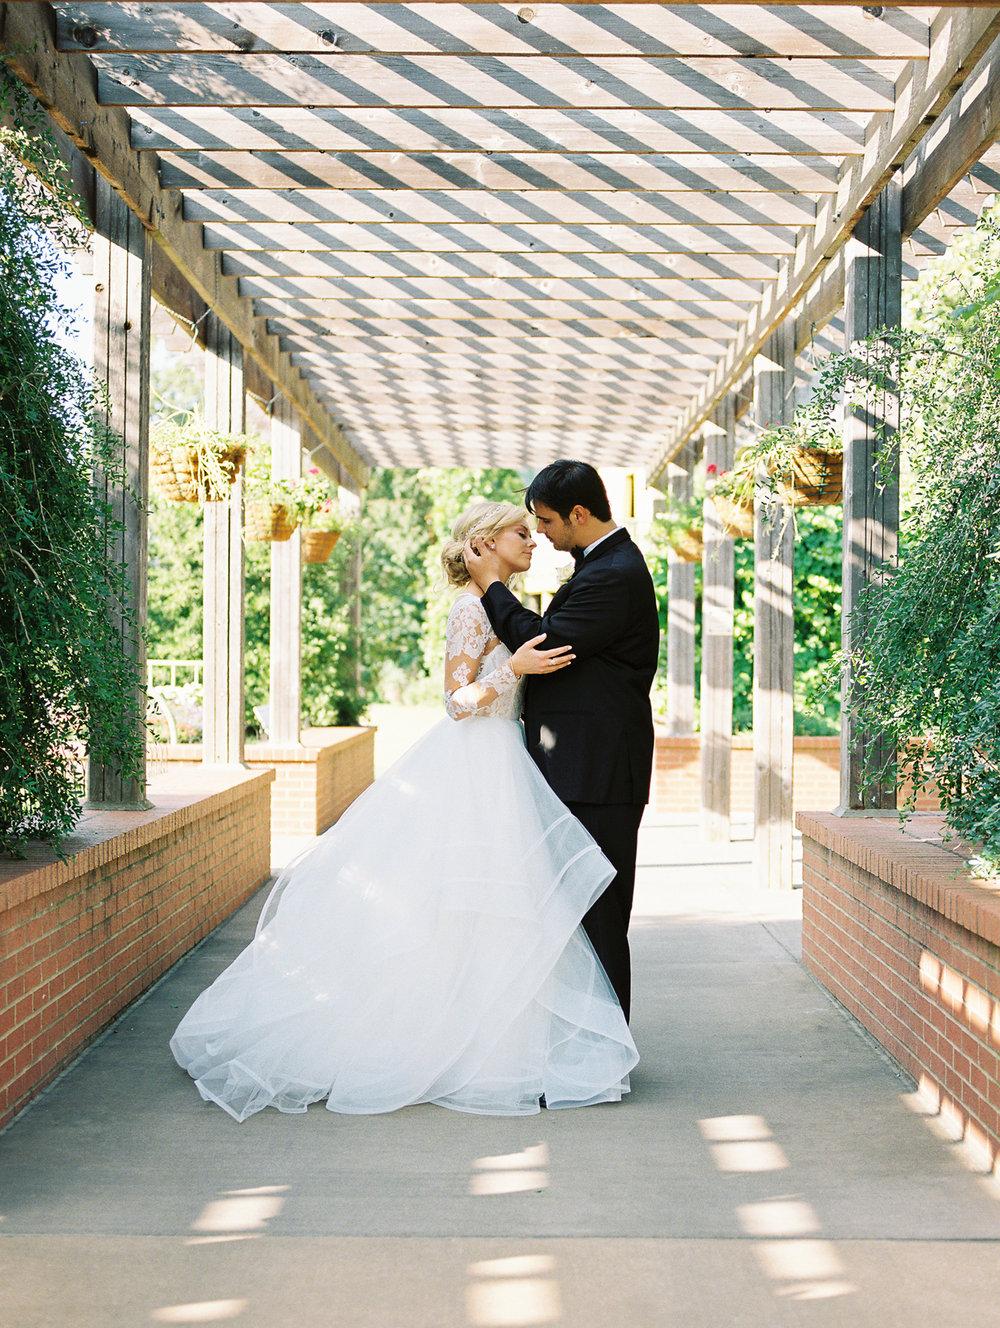 Collen & Patrick - Memphis Botanic Gardens - © Kaitlyn Stoddard Photography-1.jpg